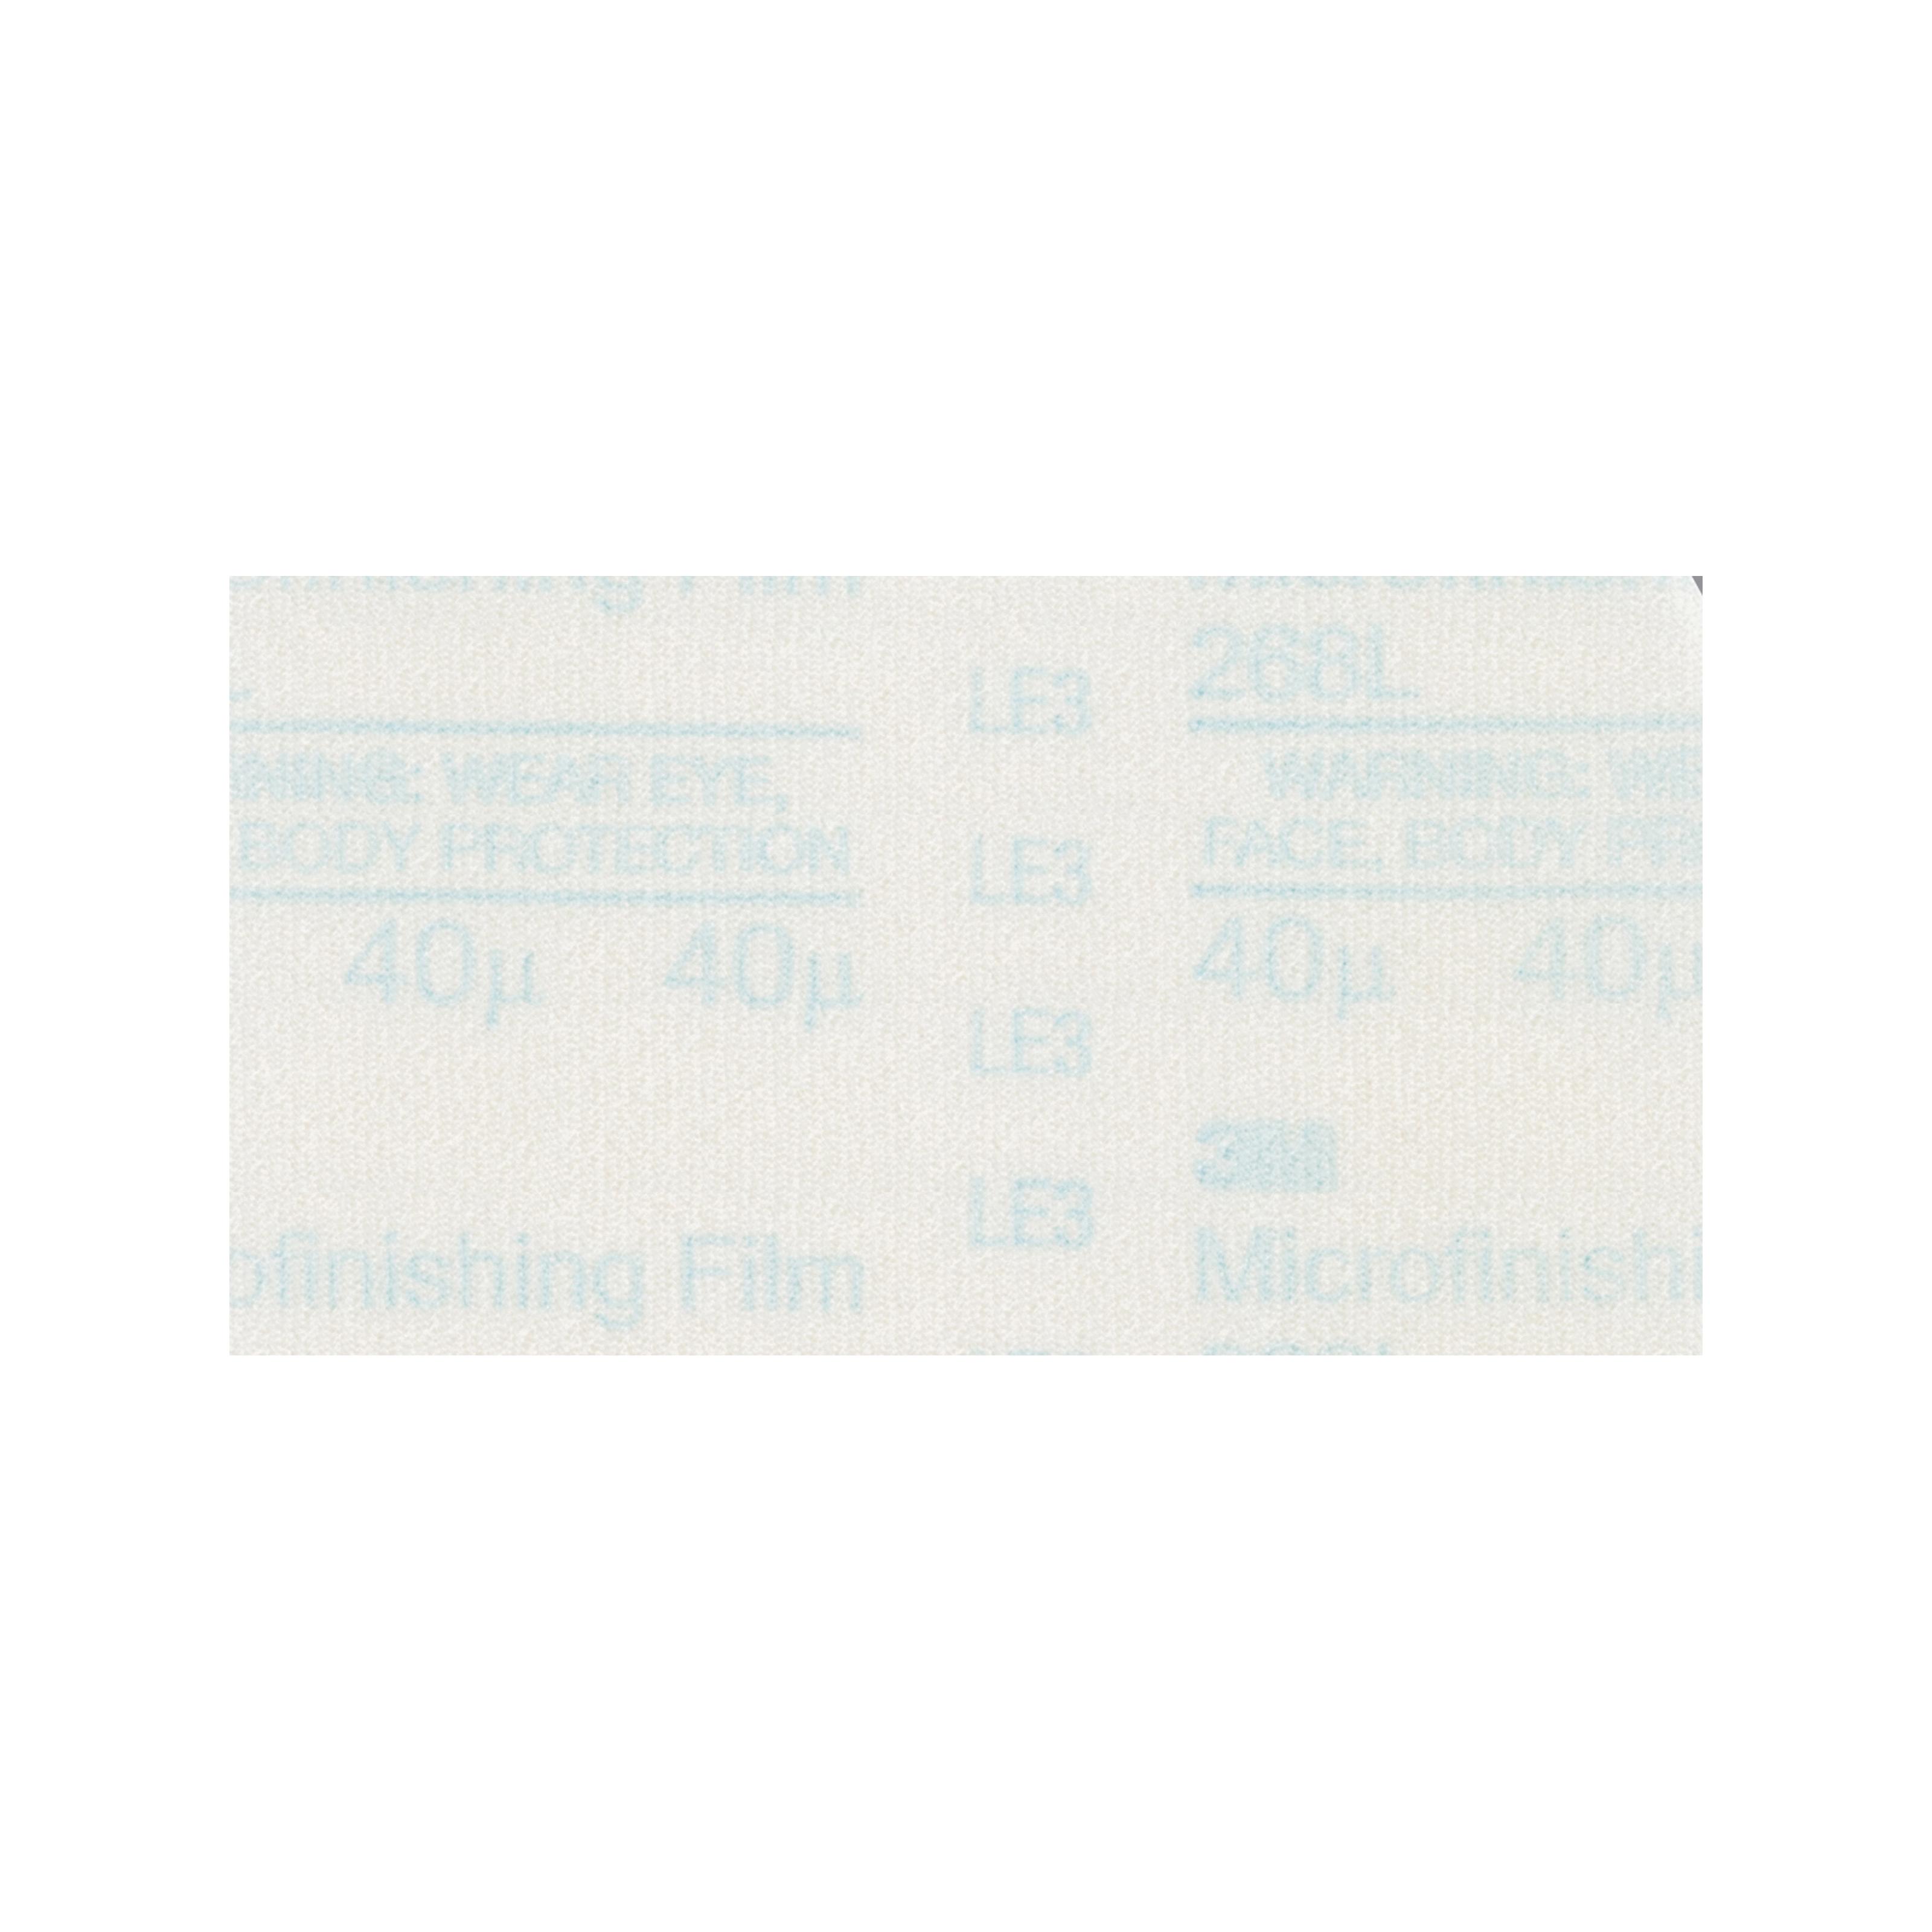 3M™ Hookit™ 051111-50132 268L Type D PSA Microfinishing Sheet, 14 in L x 12 in W, 60 micron Grit, Very Fine Grade, Aluminum Oxide Abrasive, 3 mil Polyester Film Backing